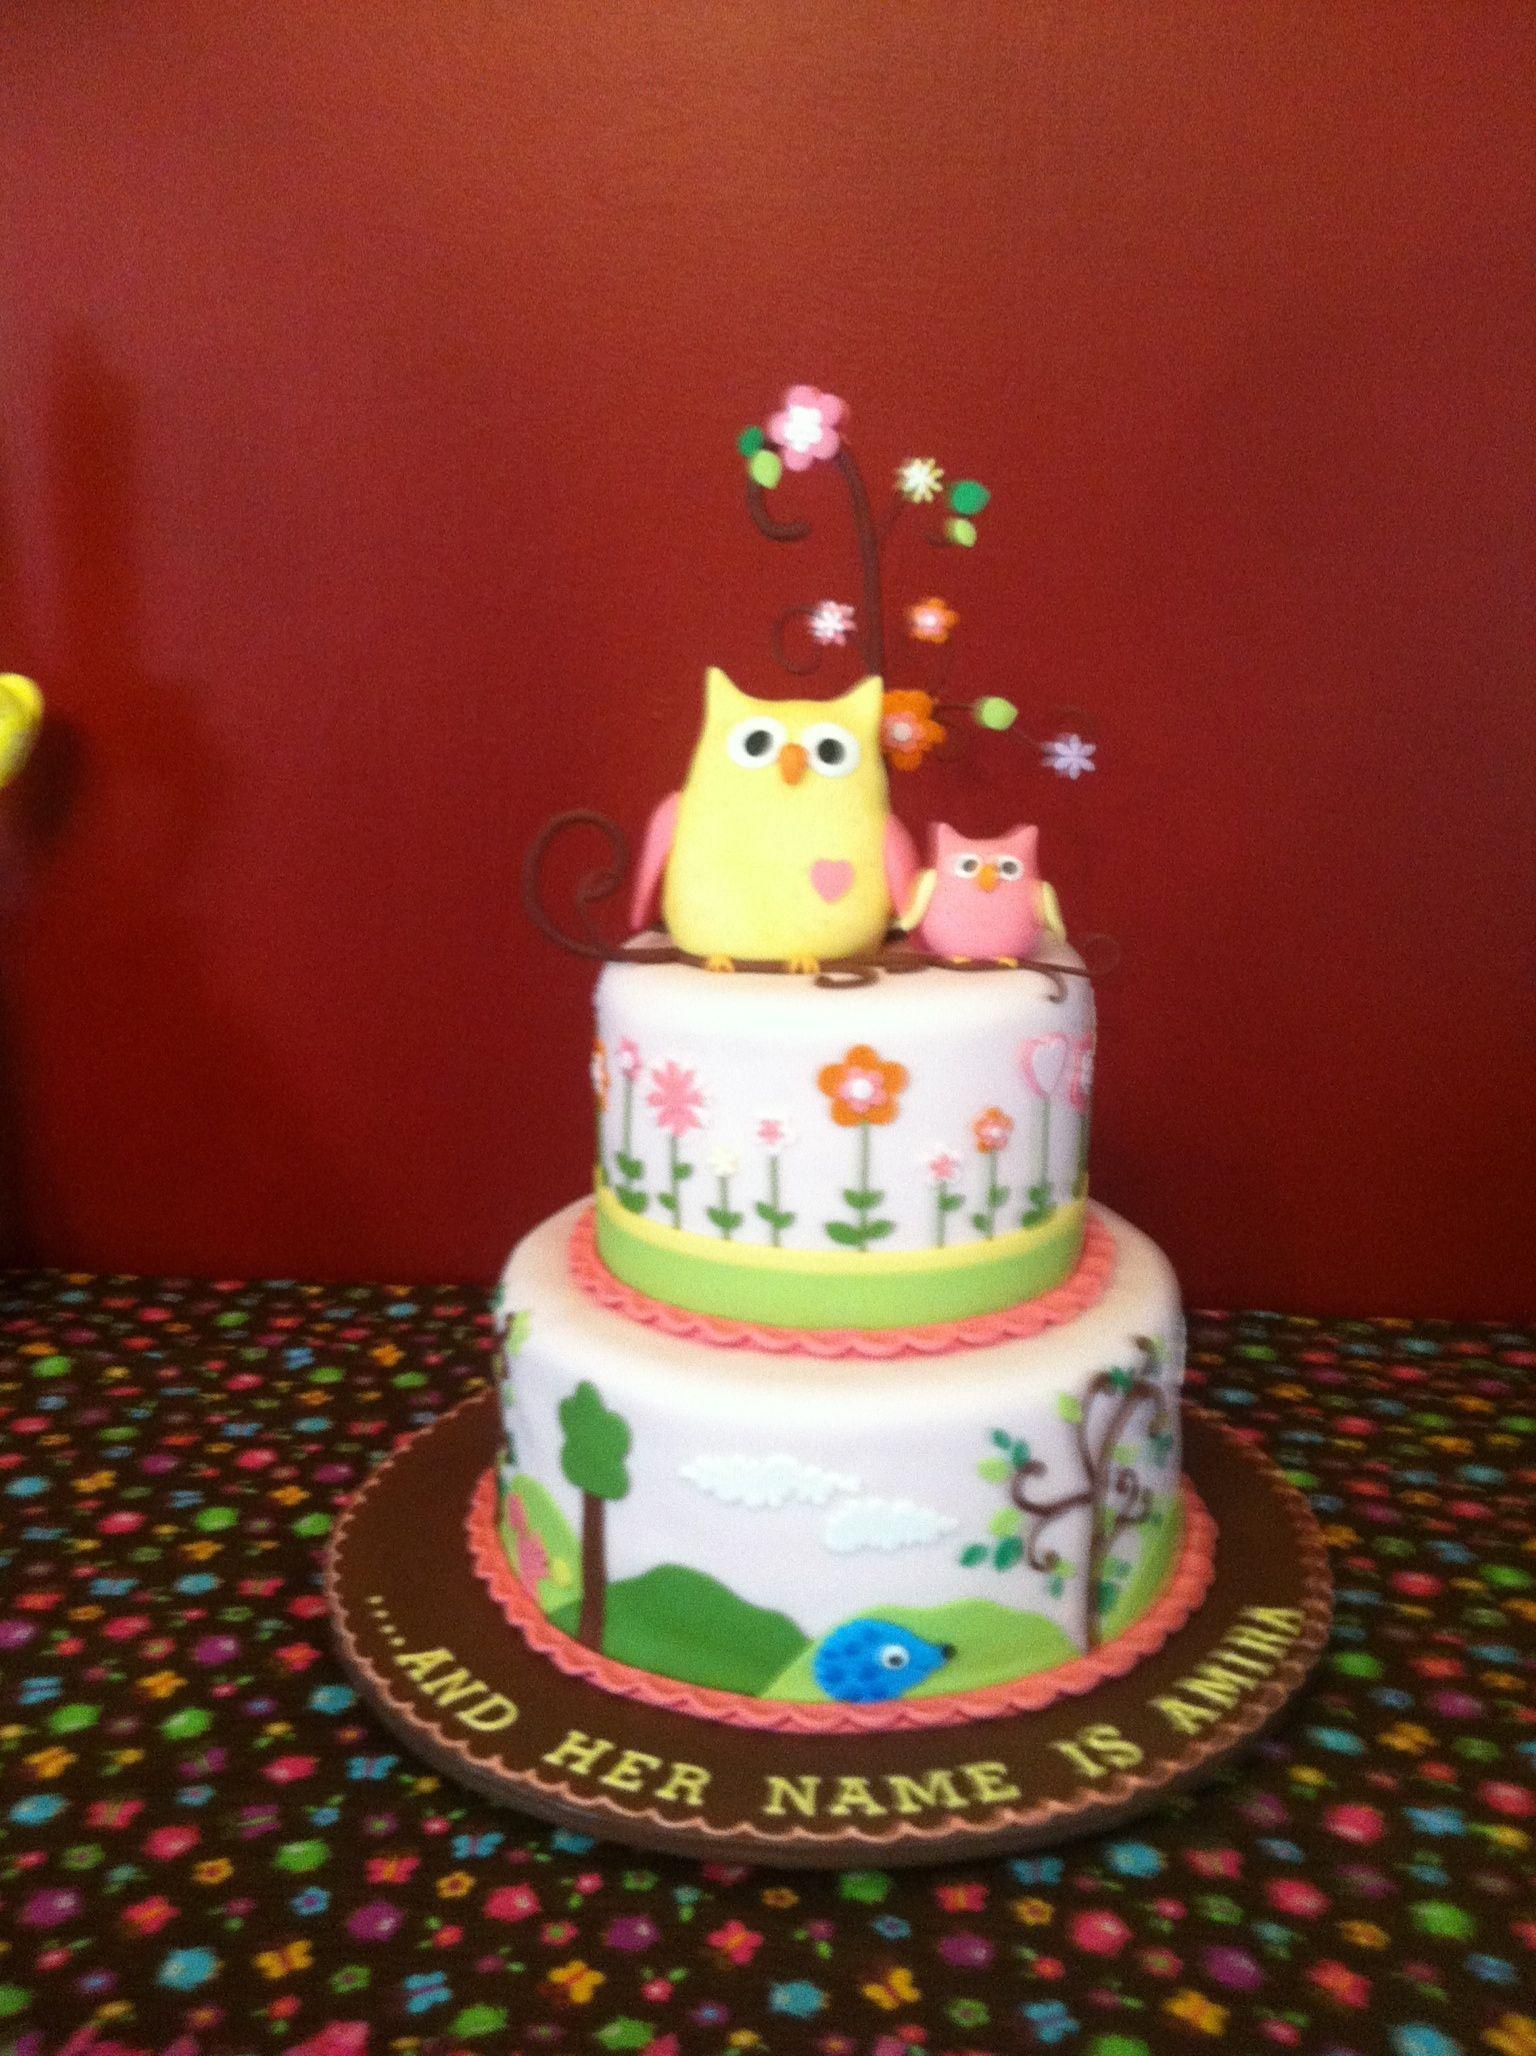 Fabulous Shower Cake To Match The Nursery Theme Of Happi